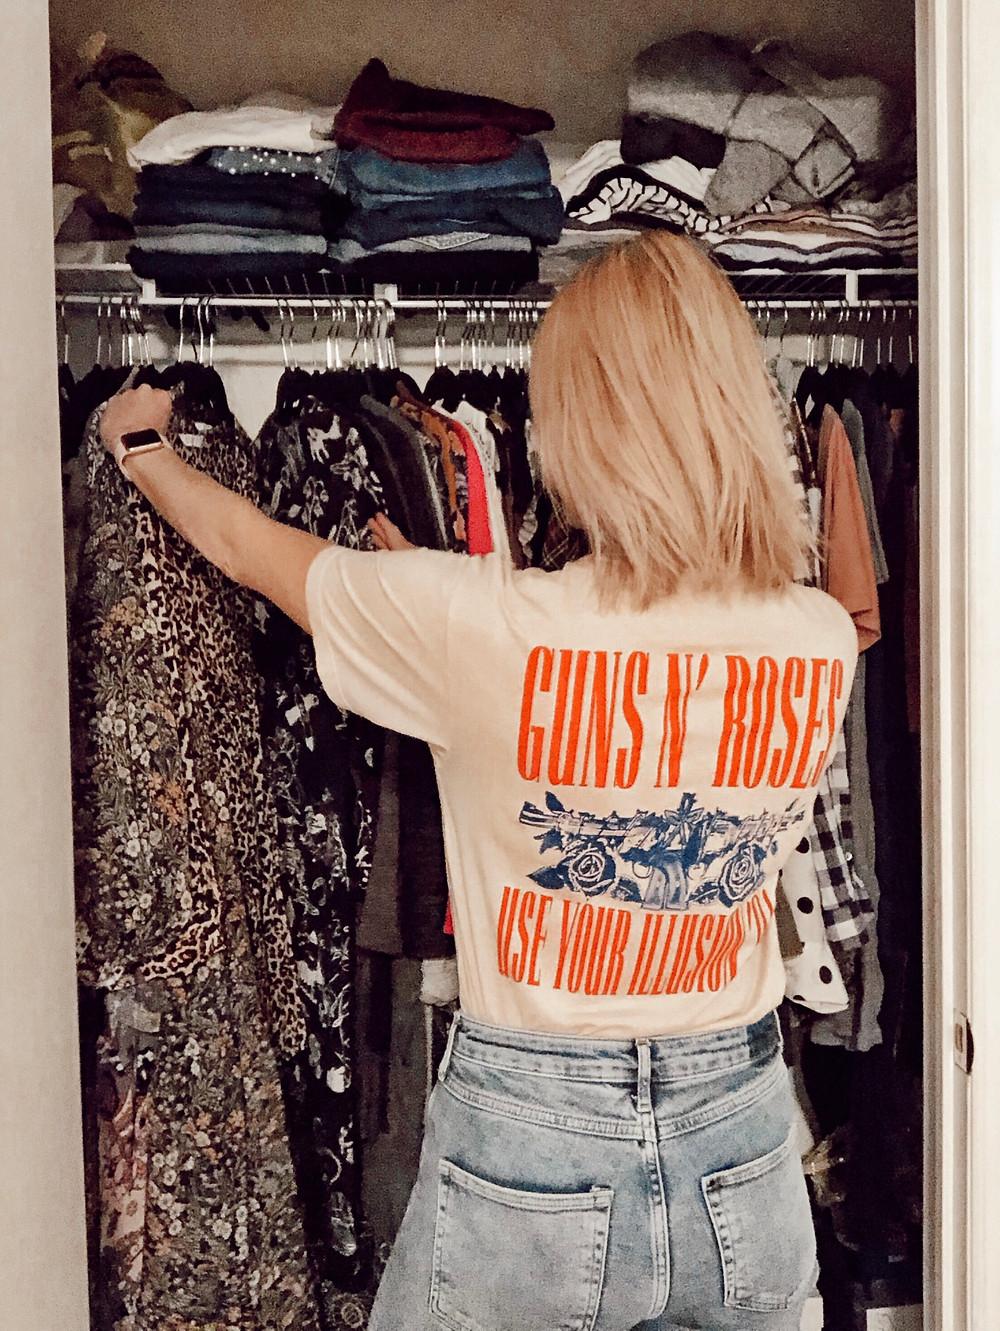 Woman looks through closet while wearing Guns n' Roses t-shirt